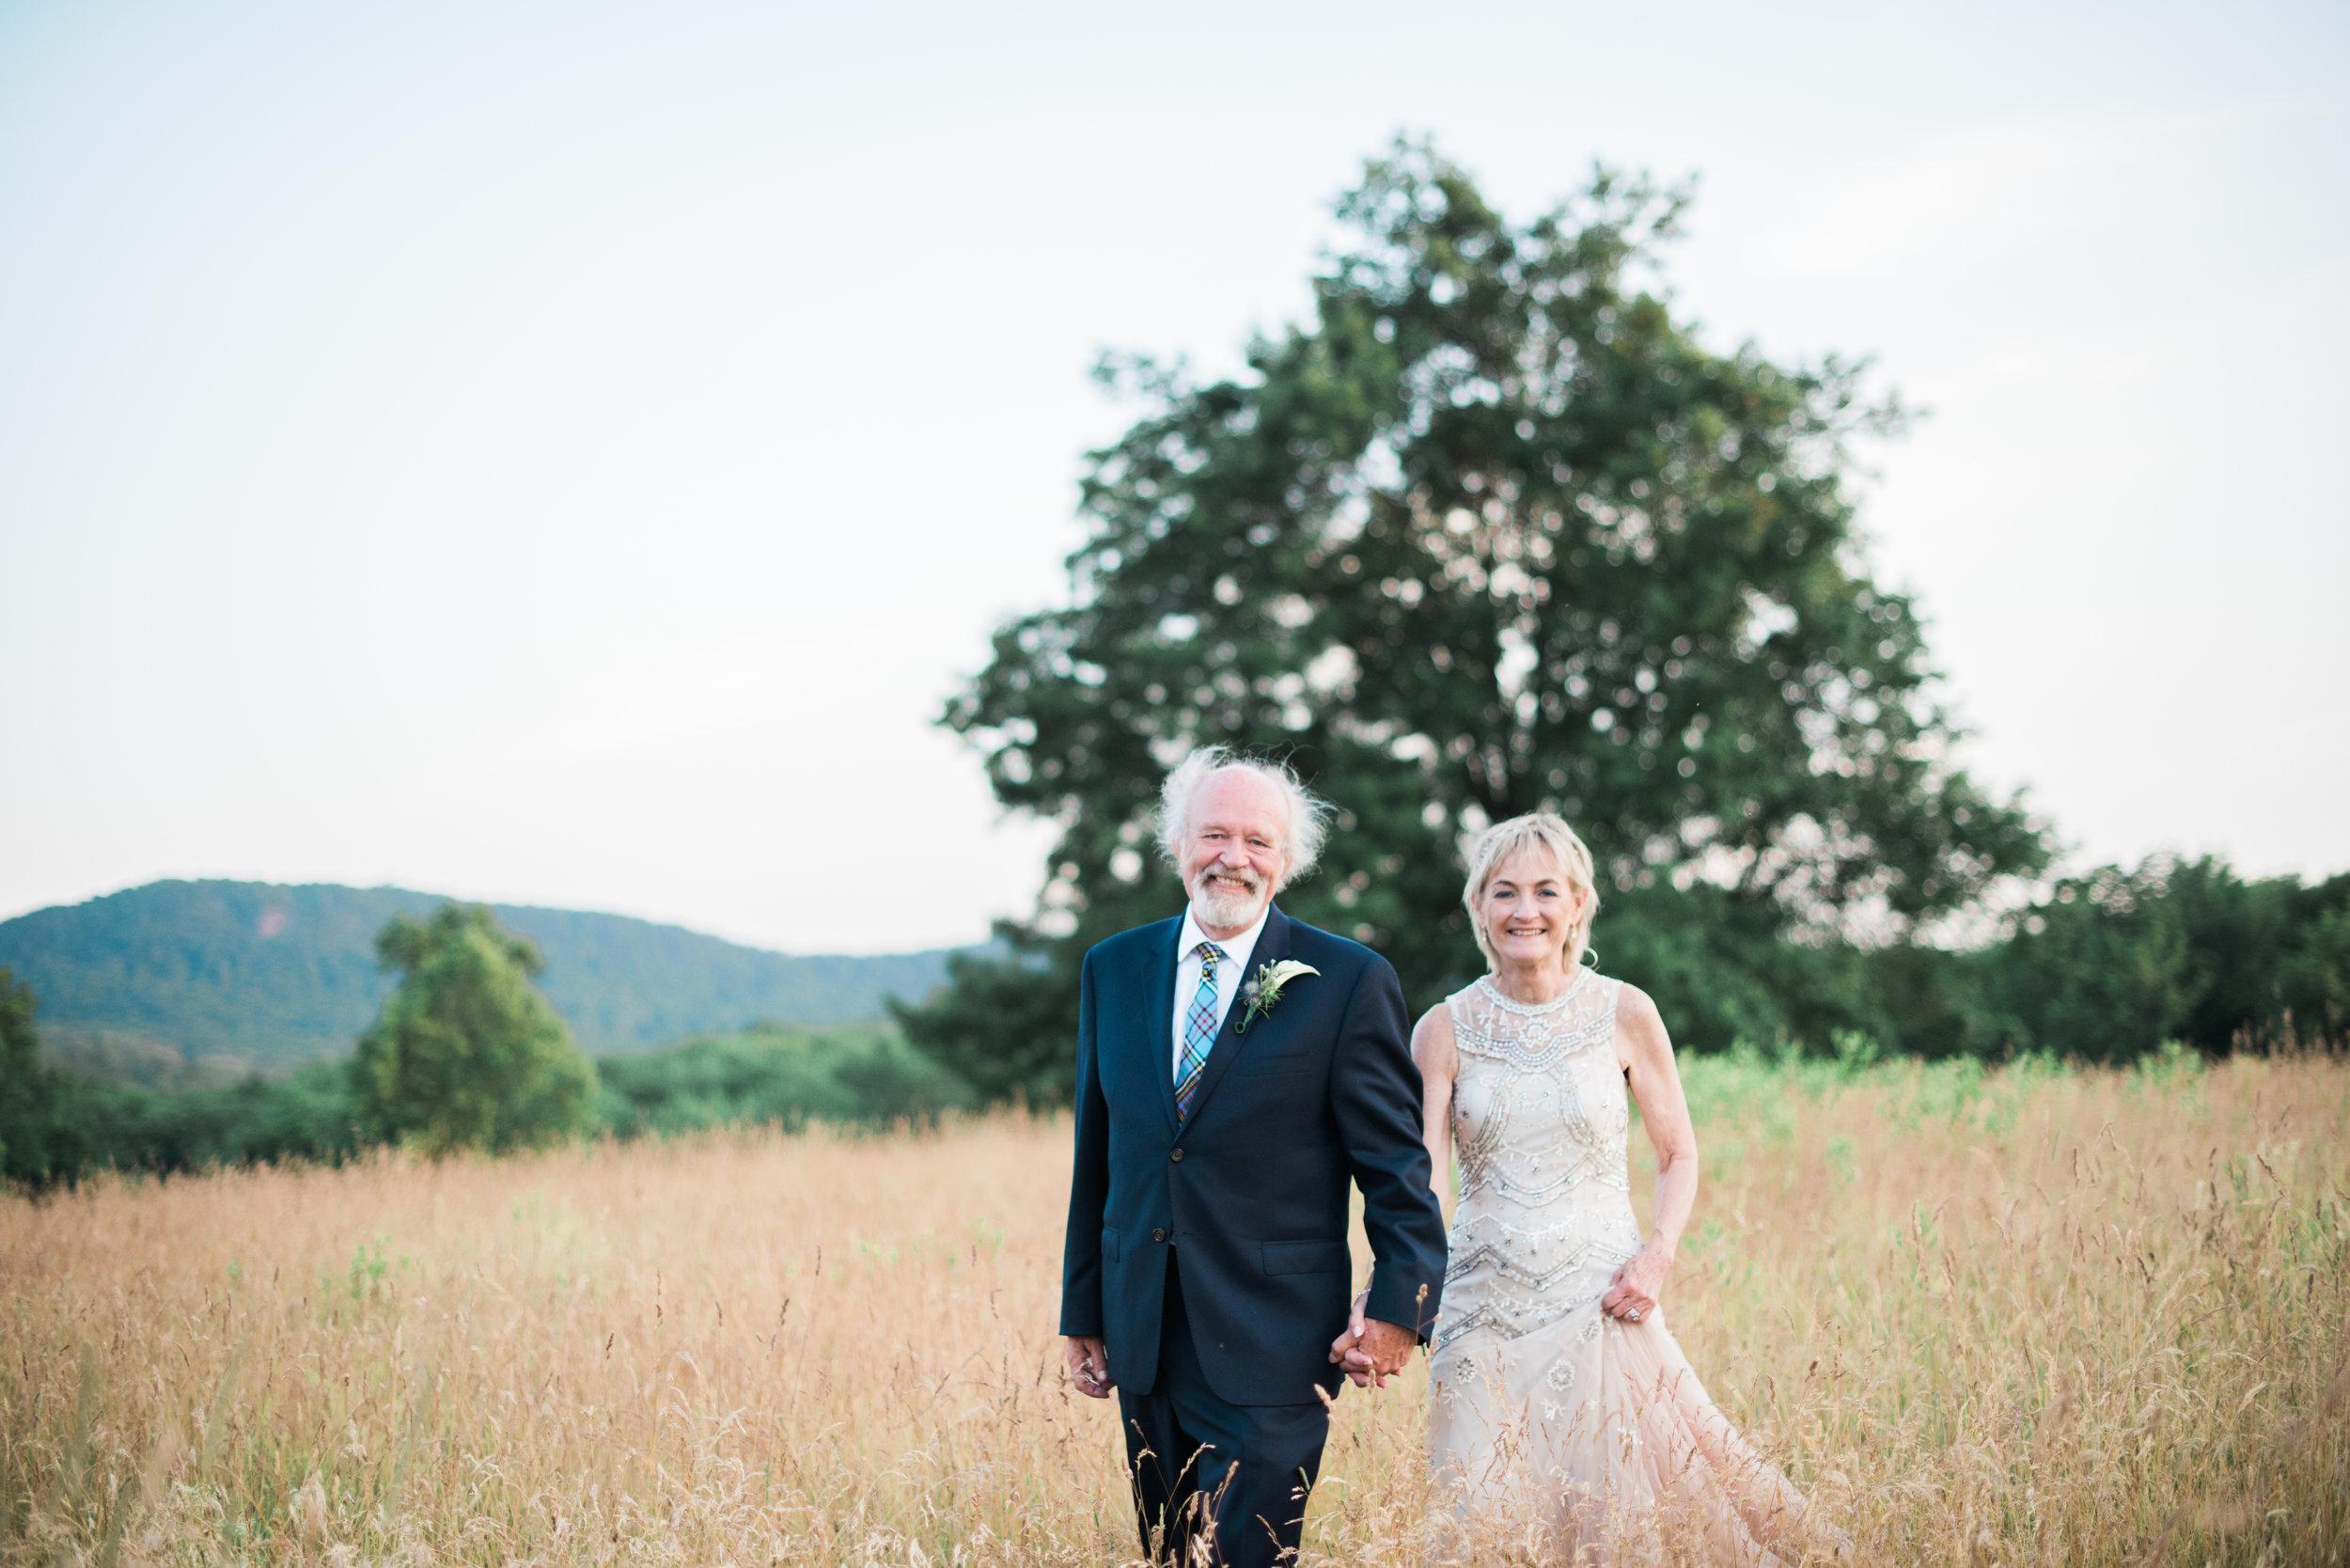 Boston Area Wedding Photography